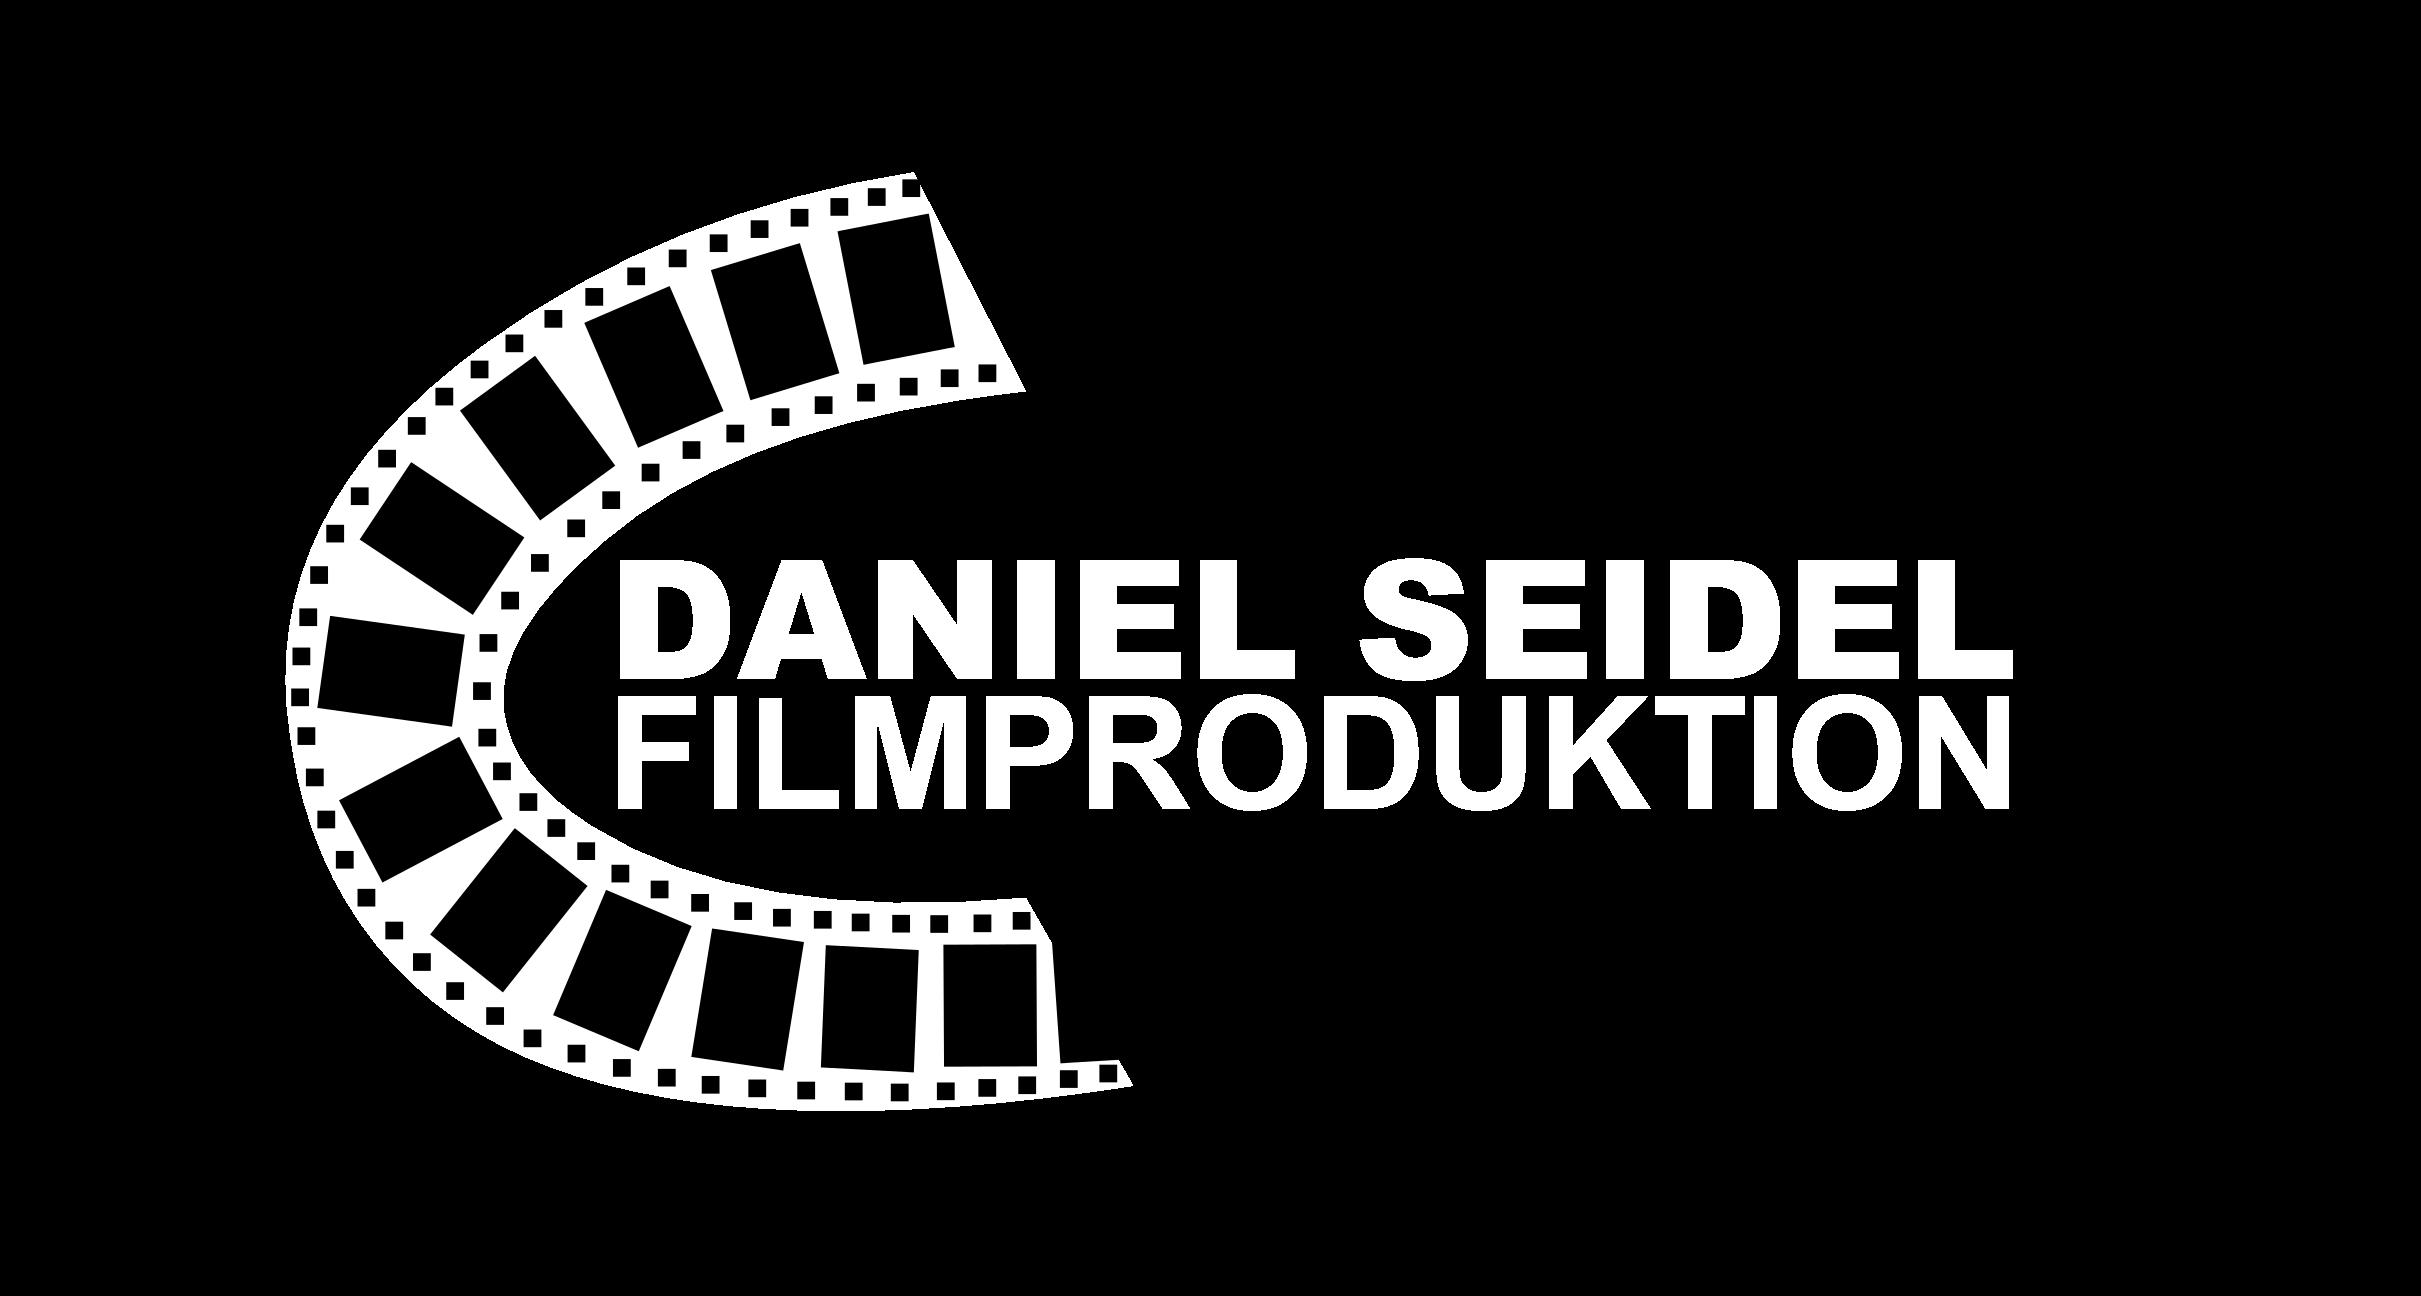 Daniel Seidel Filmproduktion